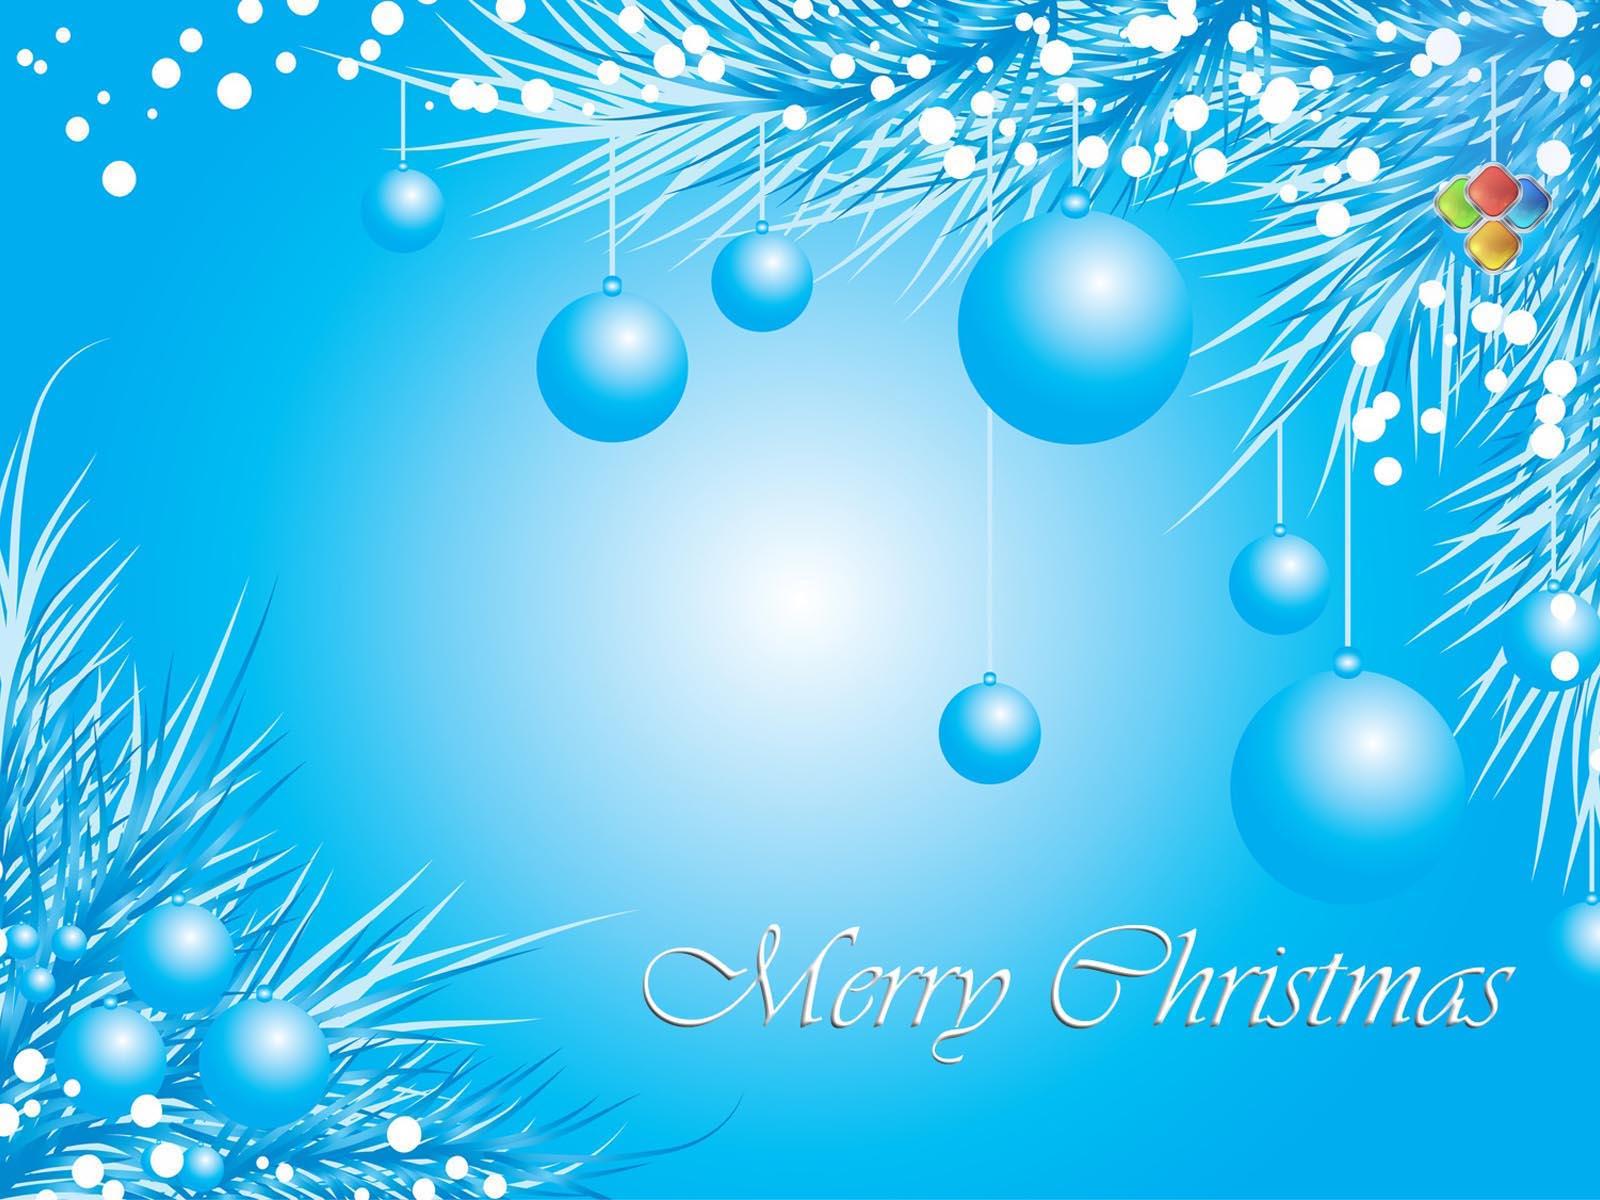 blue-christmas-2015-lights-missouri1.jpg